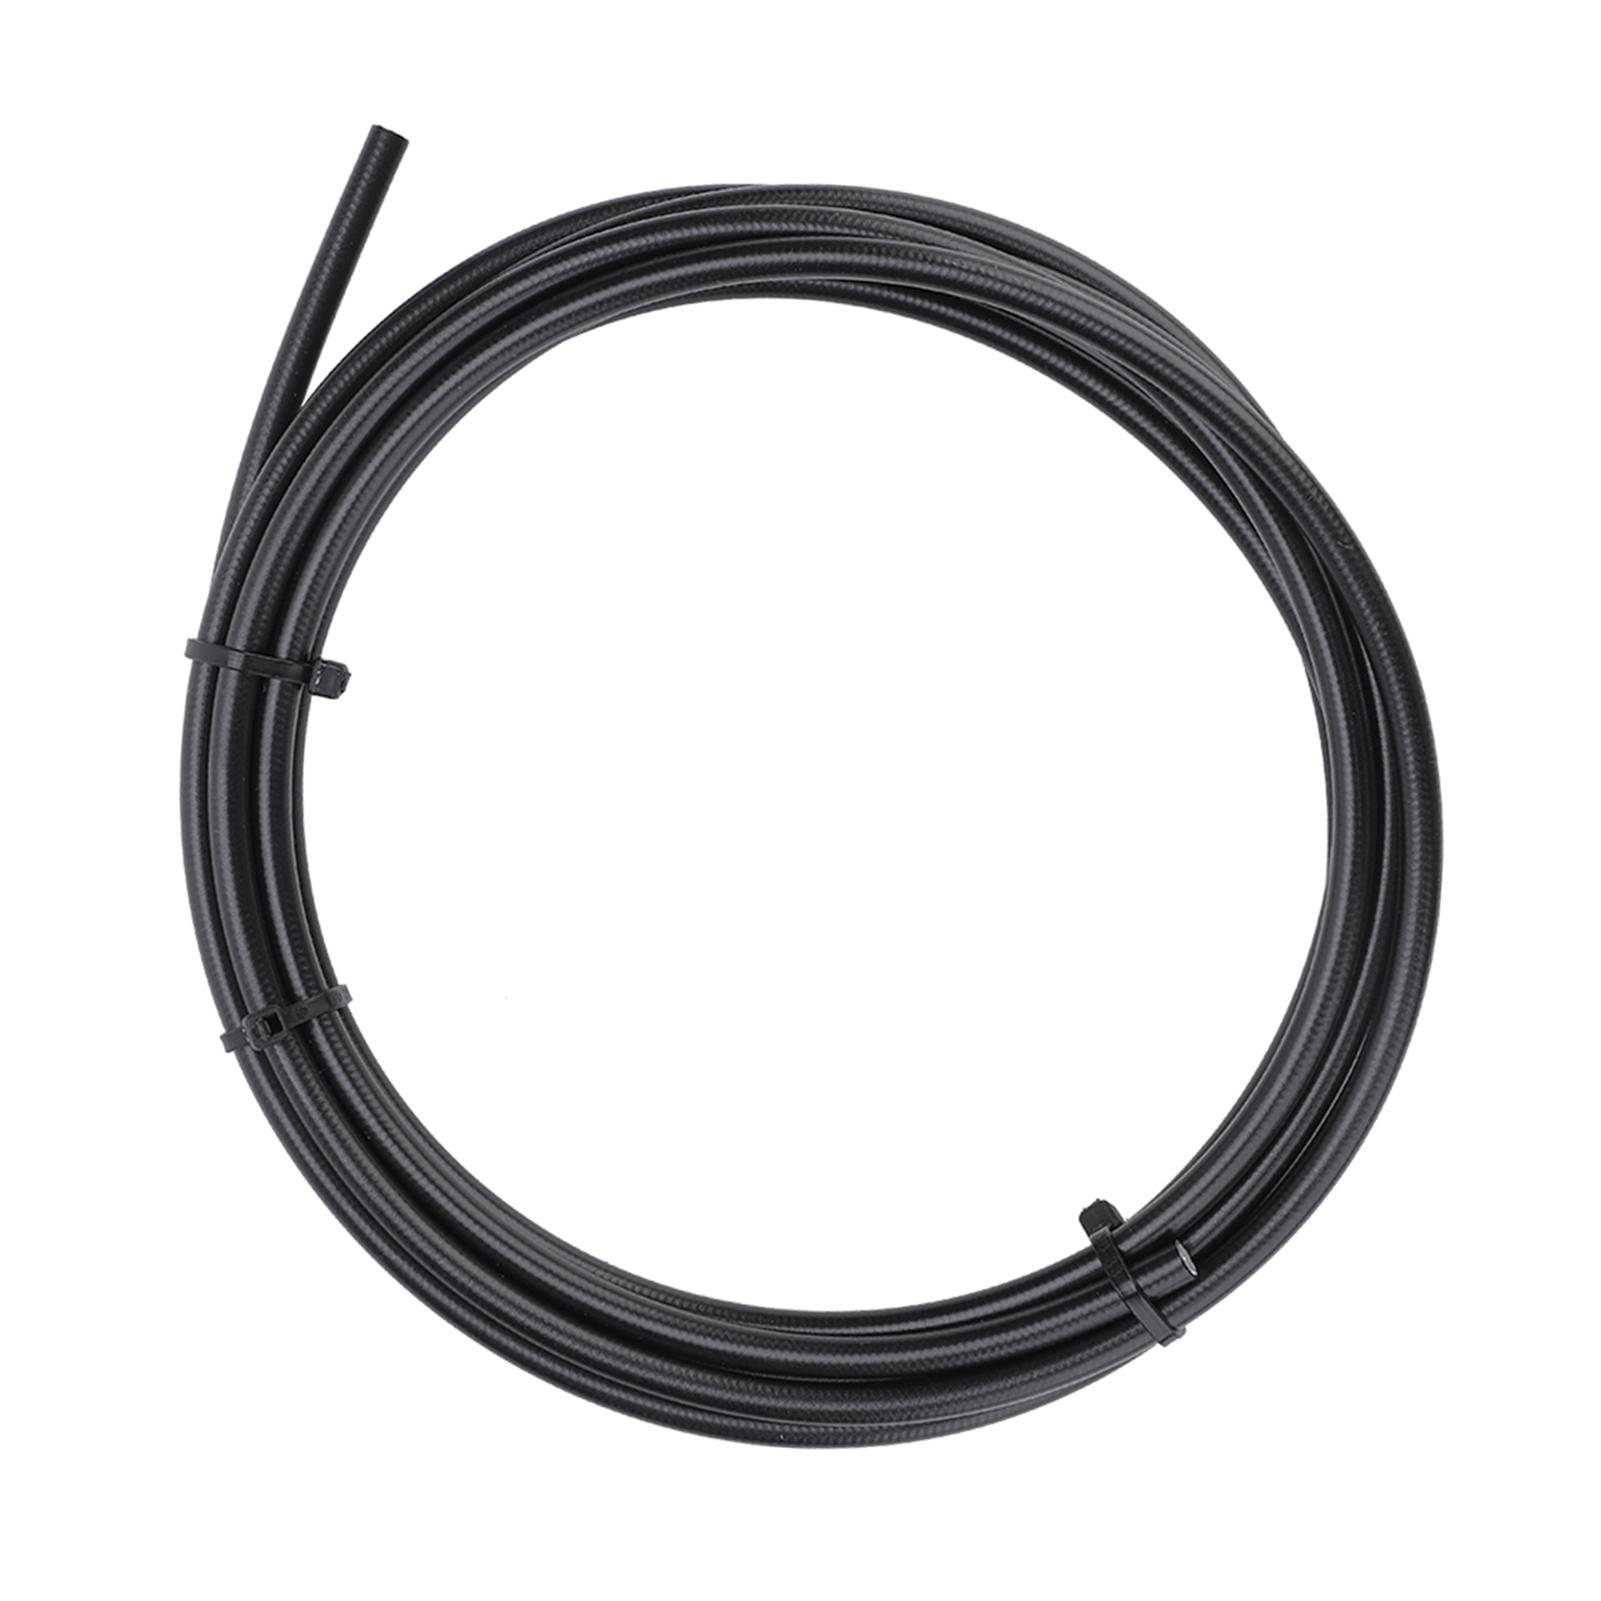 Freno-de-Disco-Hidraulico-Aceite-Tubo-Cano-Bicicleta-de-Montana-Bici-3-m-Manguera-de-Freno-para-Avid miniatura 18